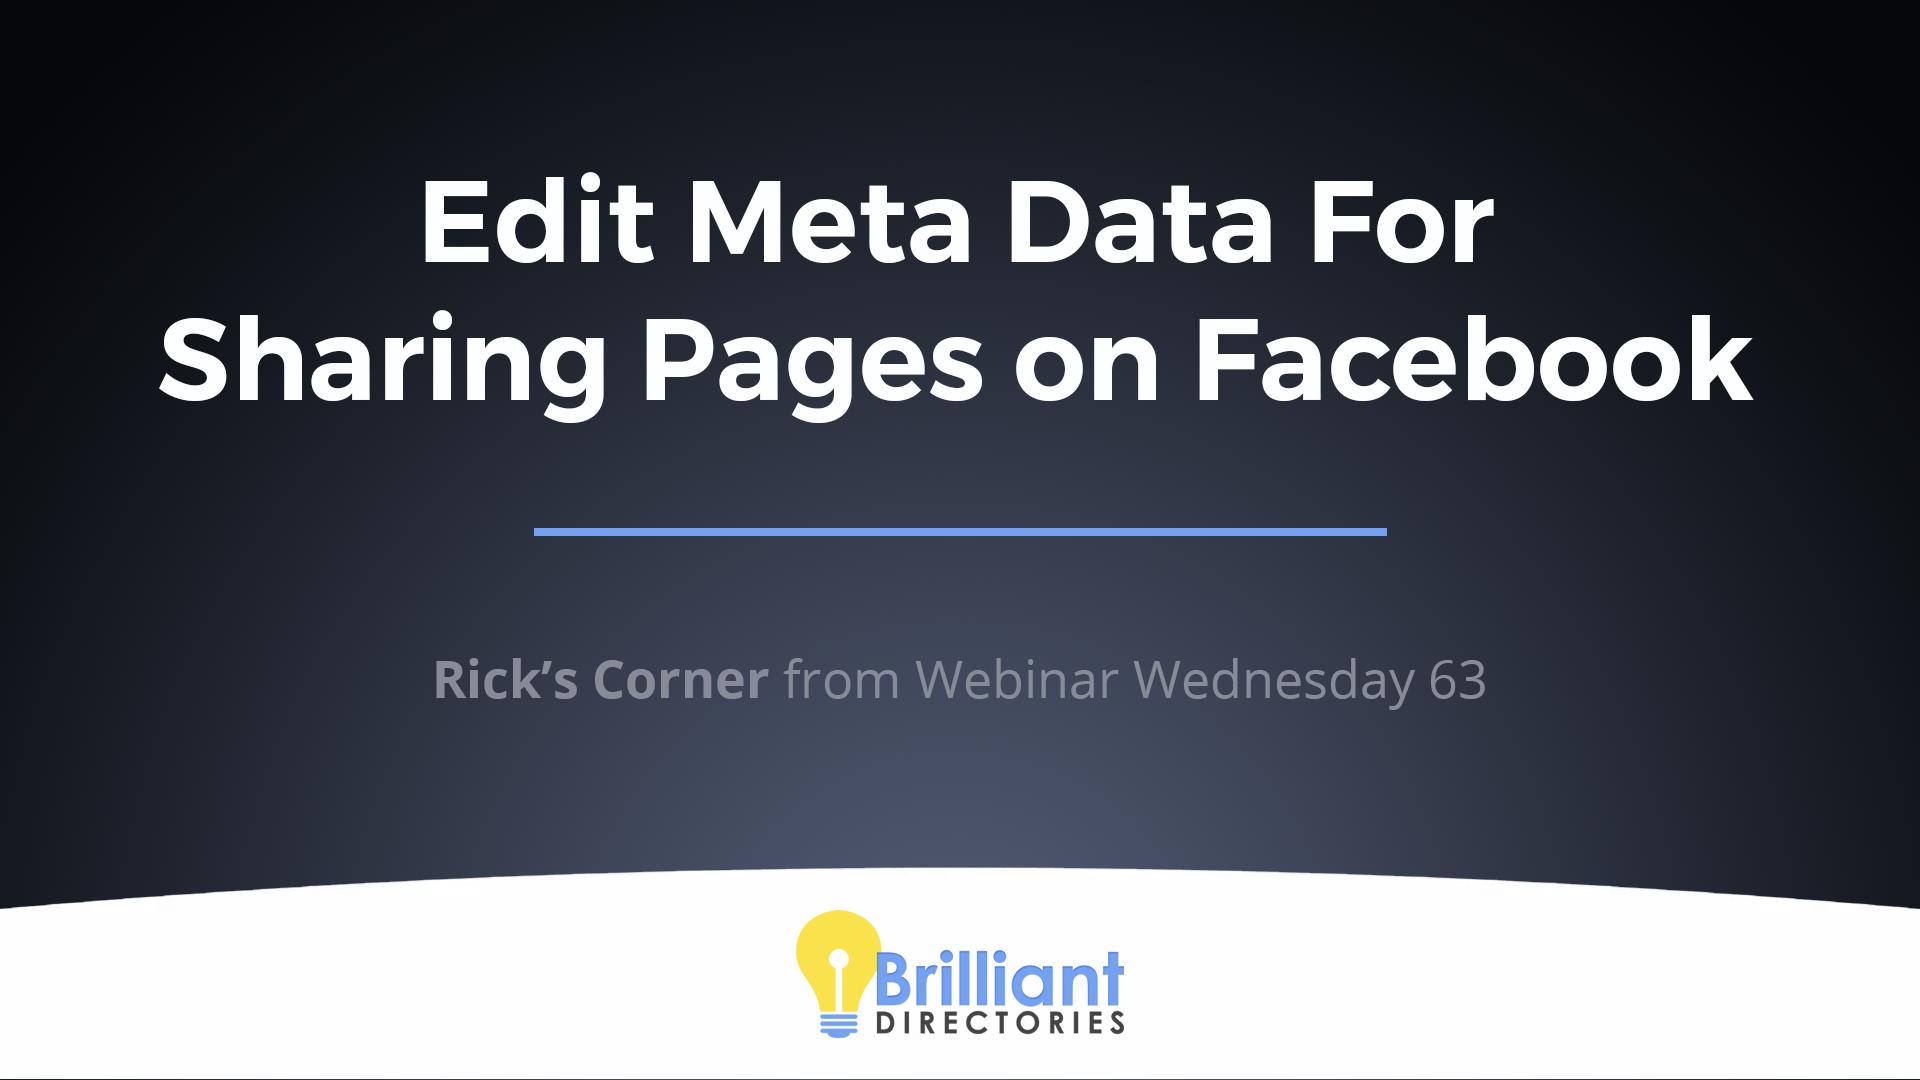 https://www.brilliantdirectories.com/blog/best-facebook-sharing-tips-for-membership-website-meta-data